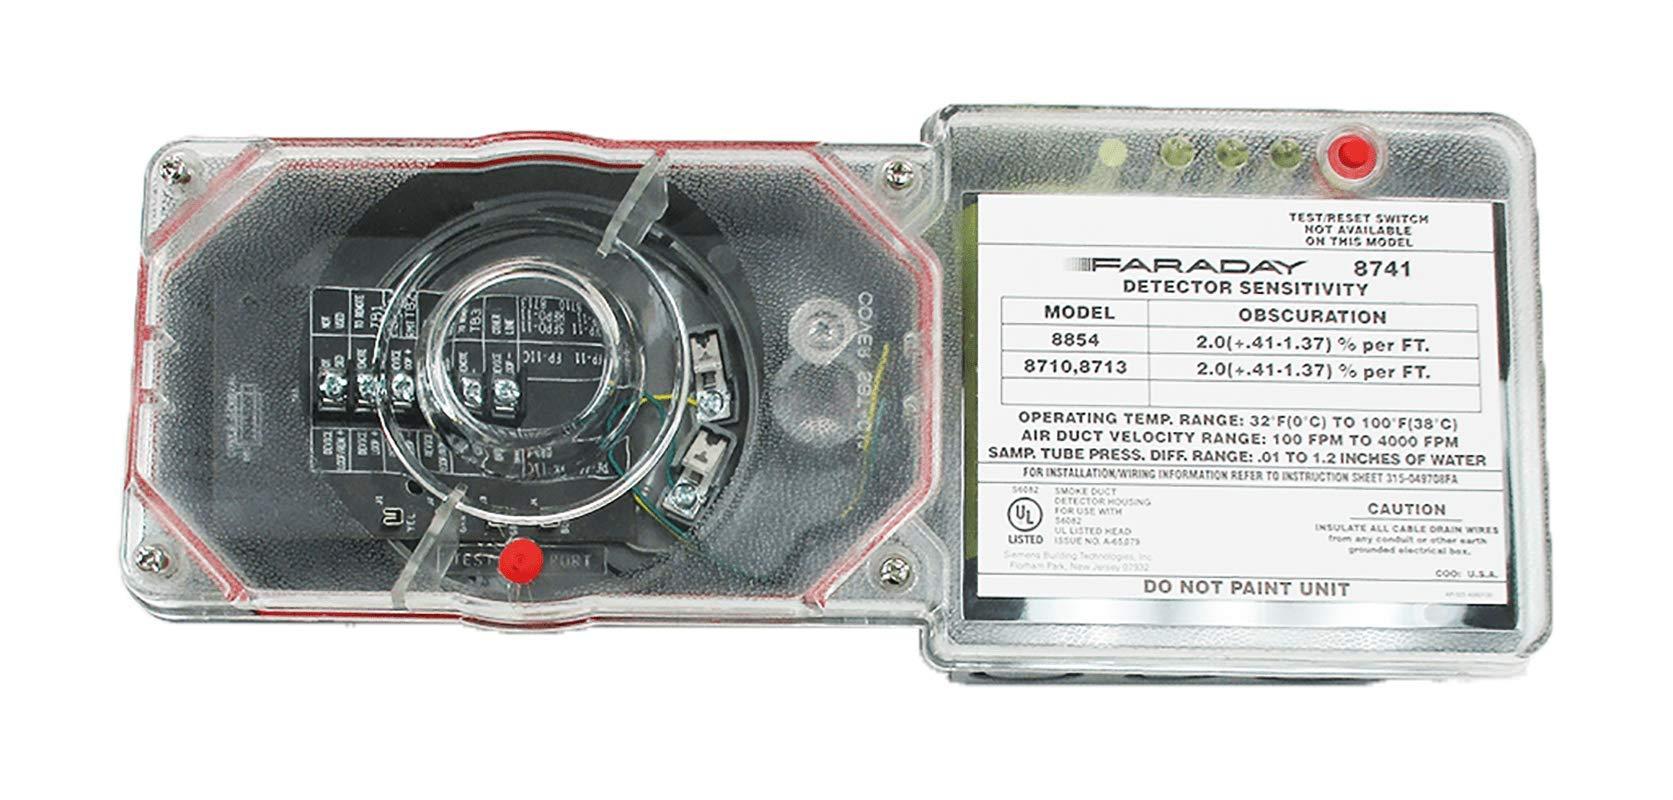 Faraday 8741